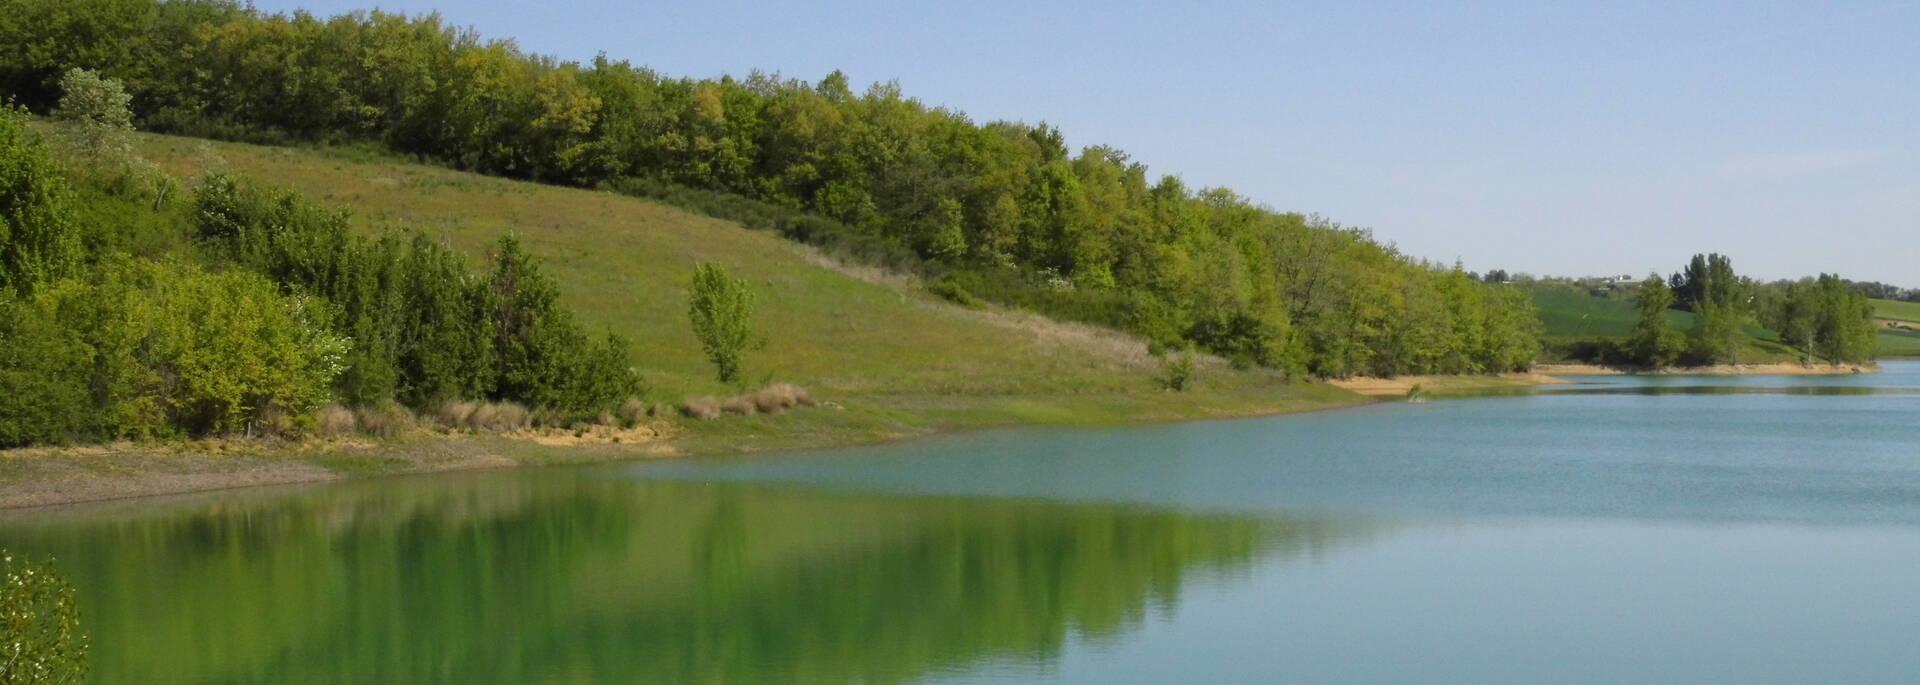 Lac de Pellefigue, Savès